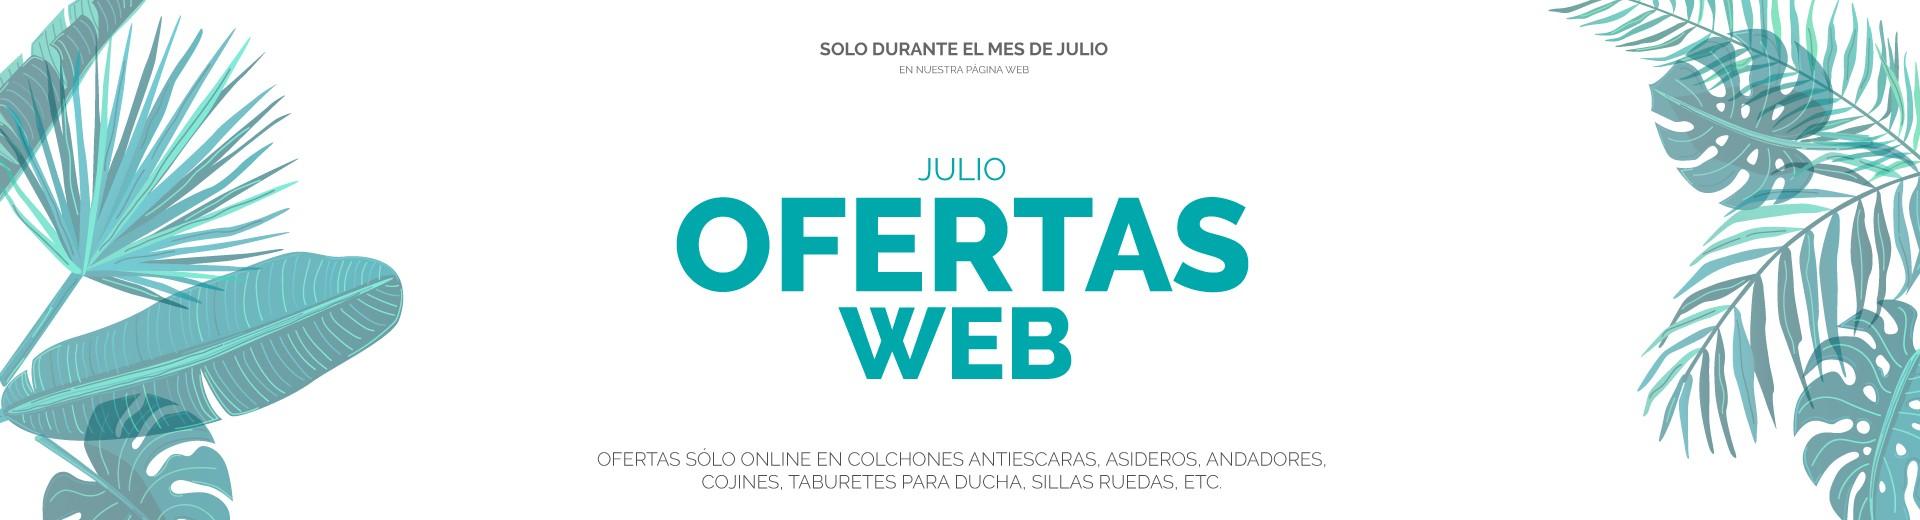 OFERTAS WEB JULIO 2021